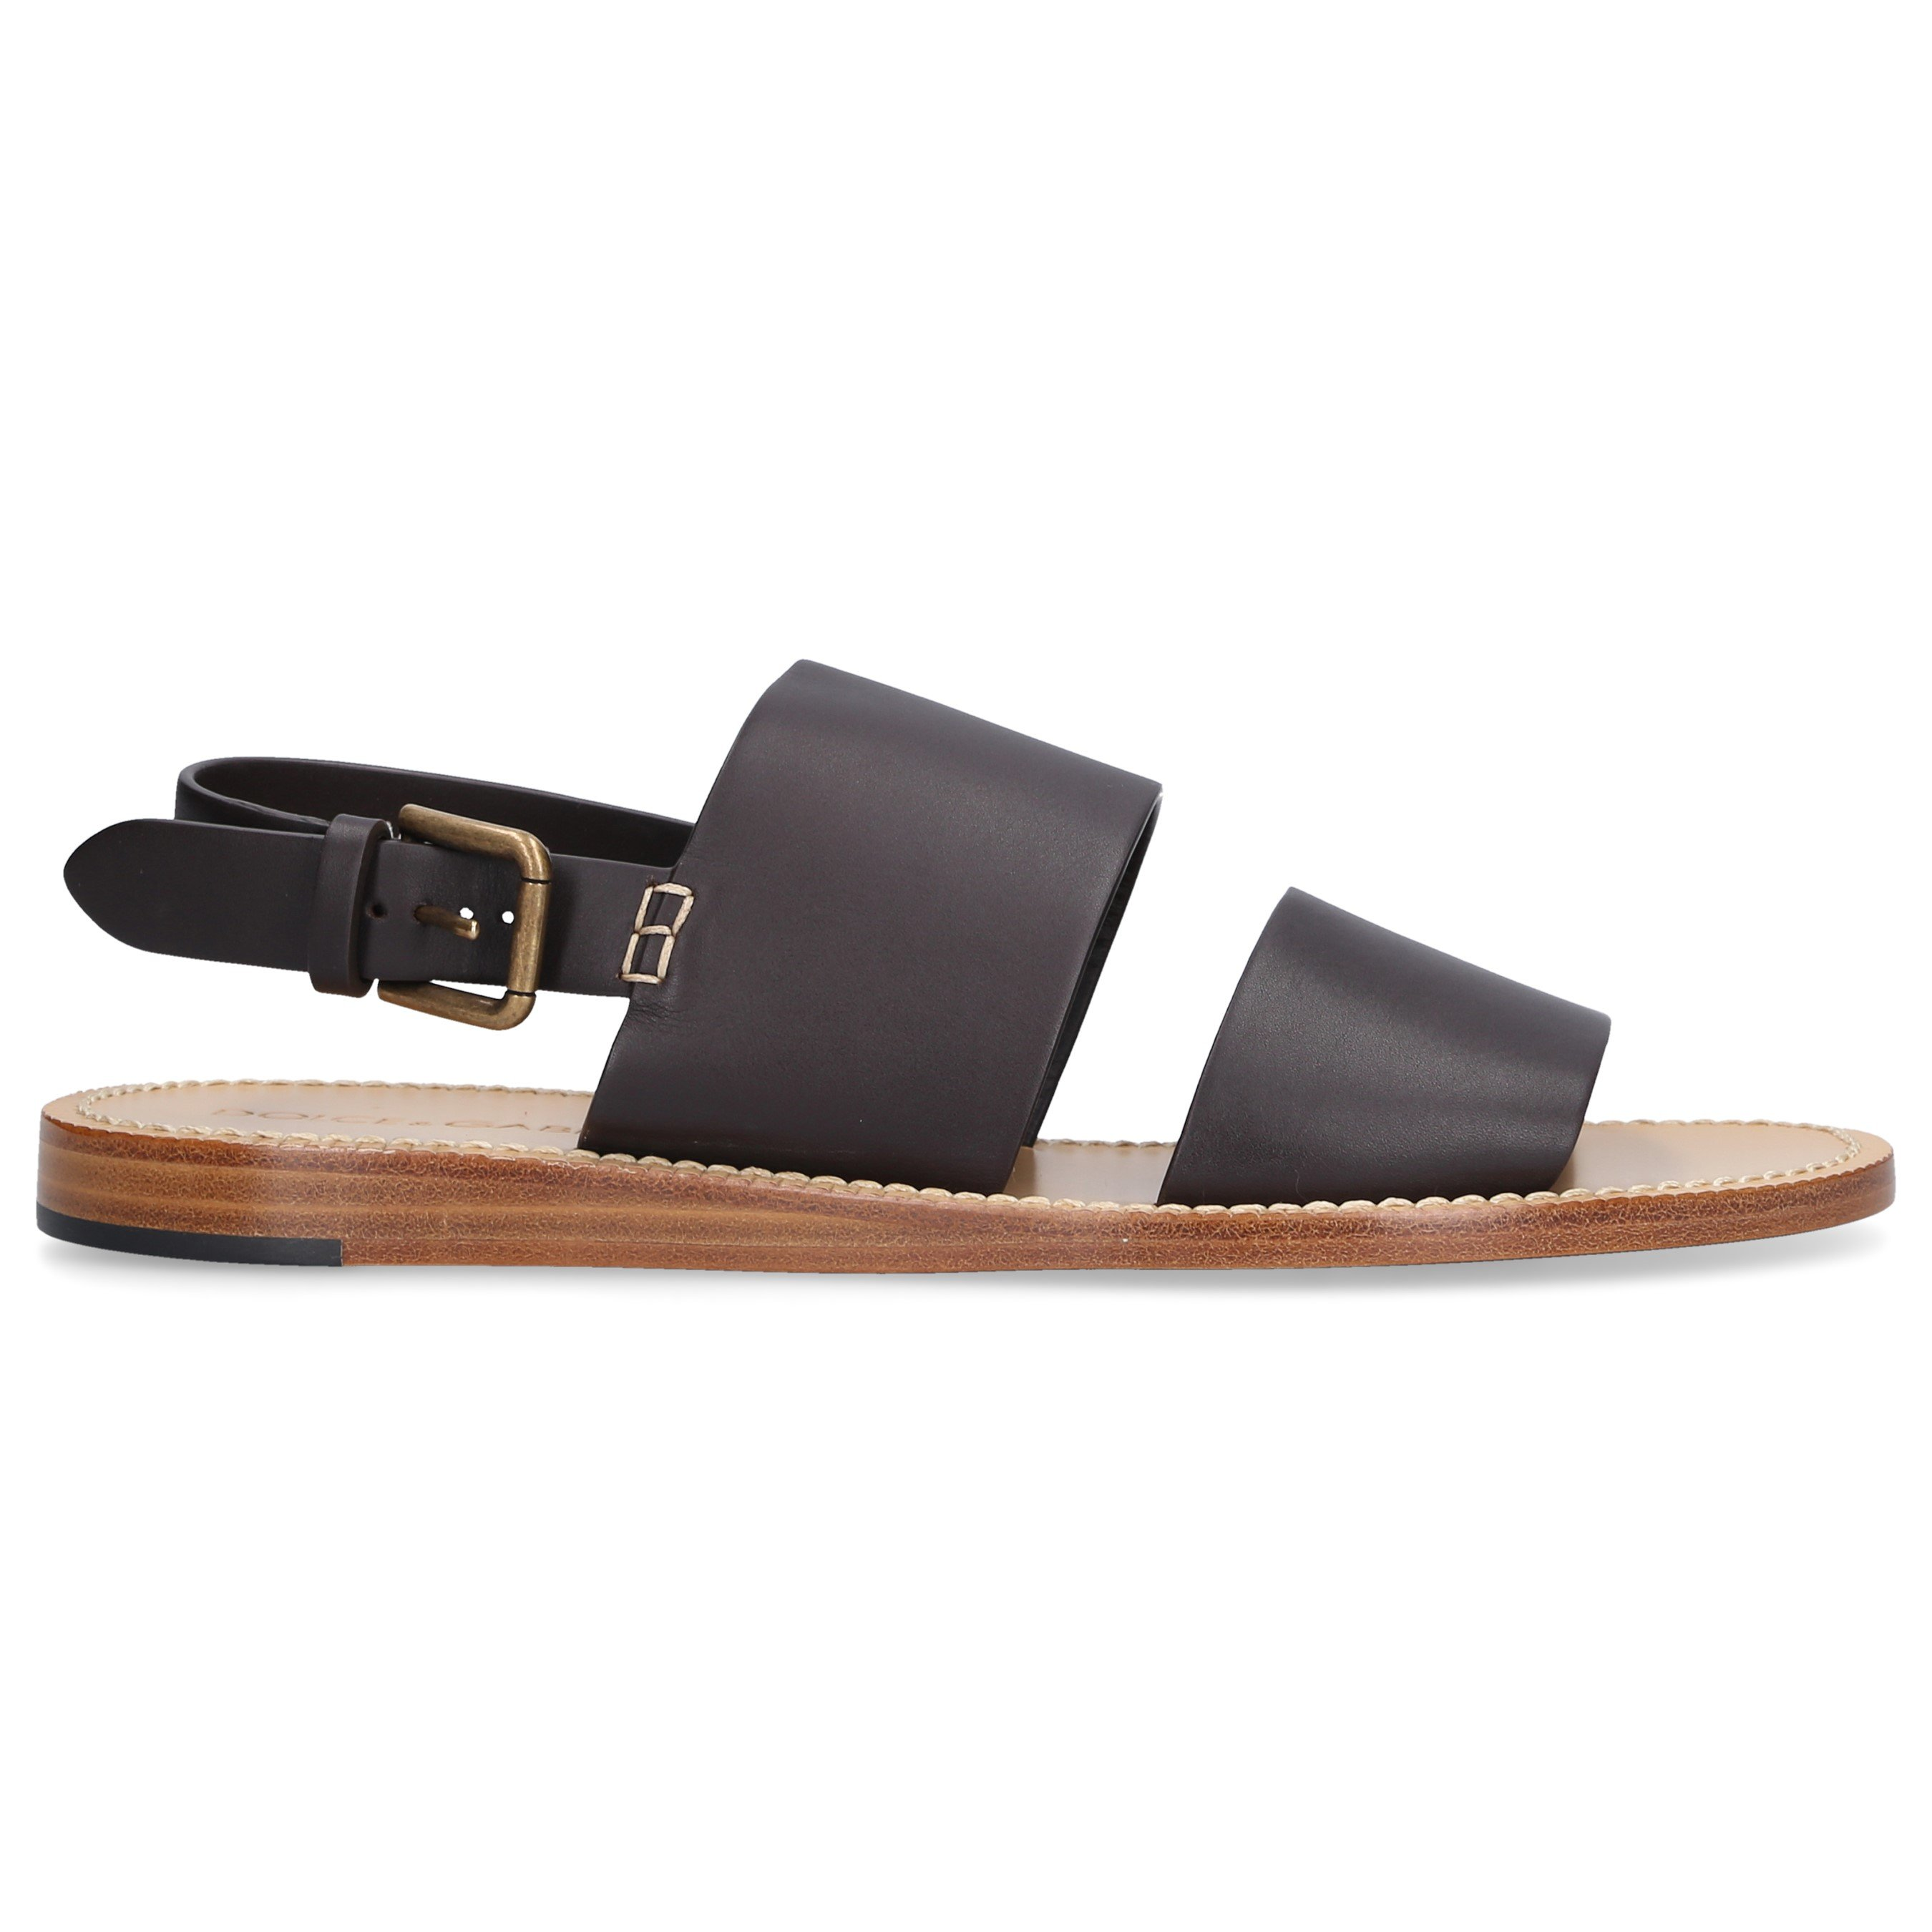 Dolce & Gabbana Leathers MEN SANDALS PANTHENON